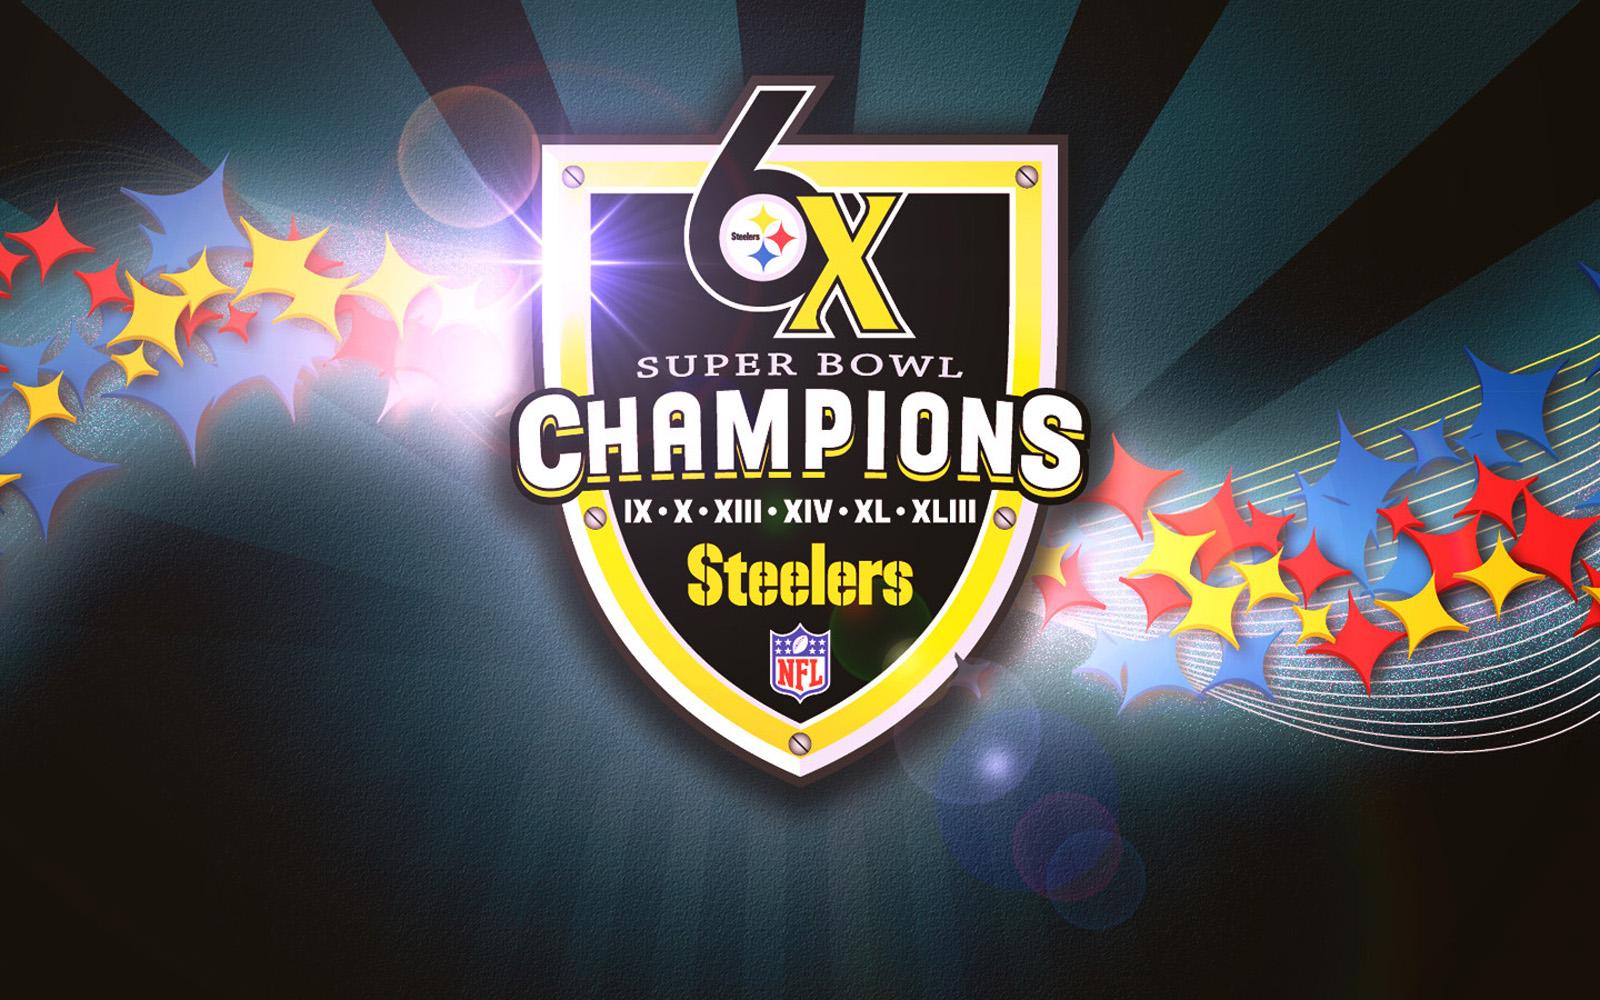 Champions Steelers Desktop Wallpaper cute Wallpapers 1600x1000